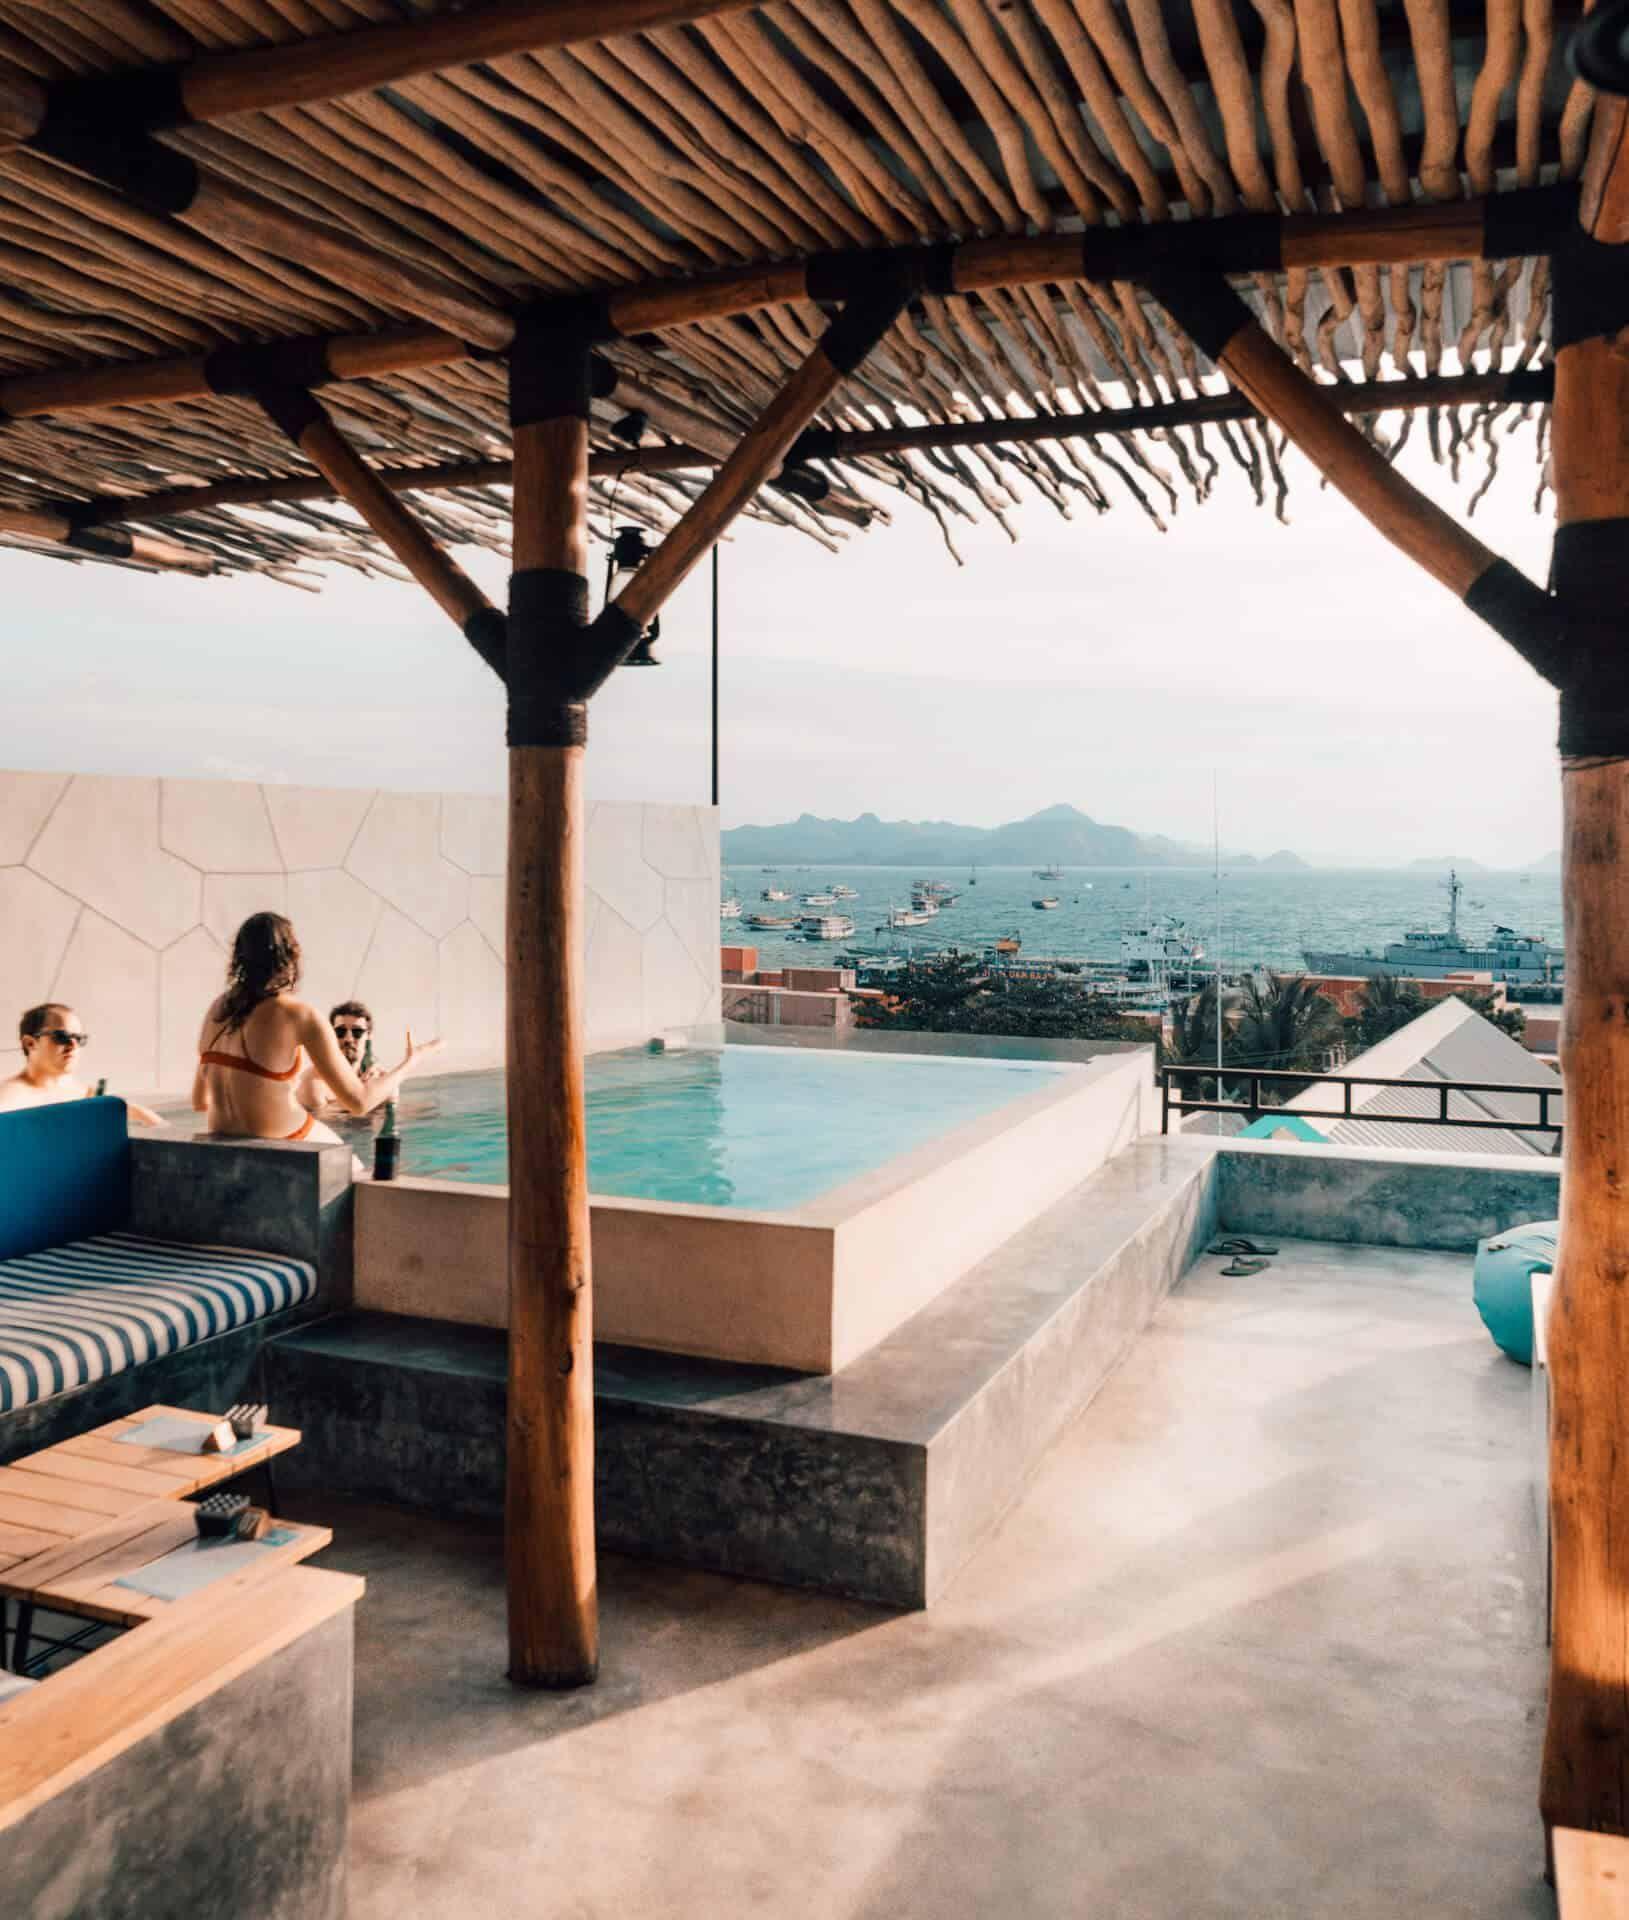 11 Things To Do in Labuan Bajo, Flores | Labuan, Komodo ...